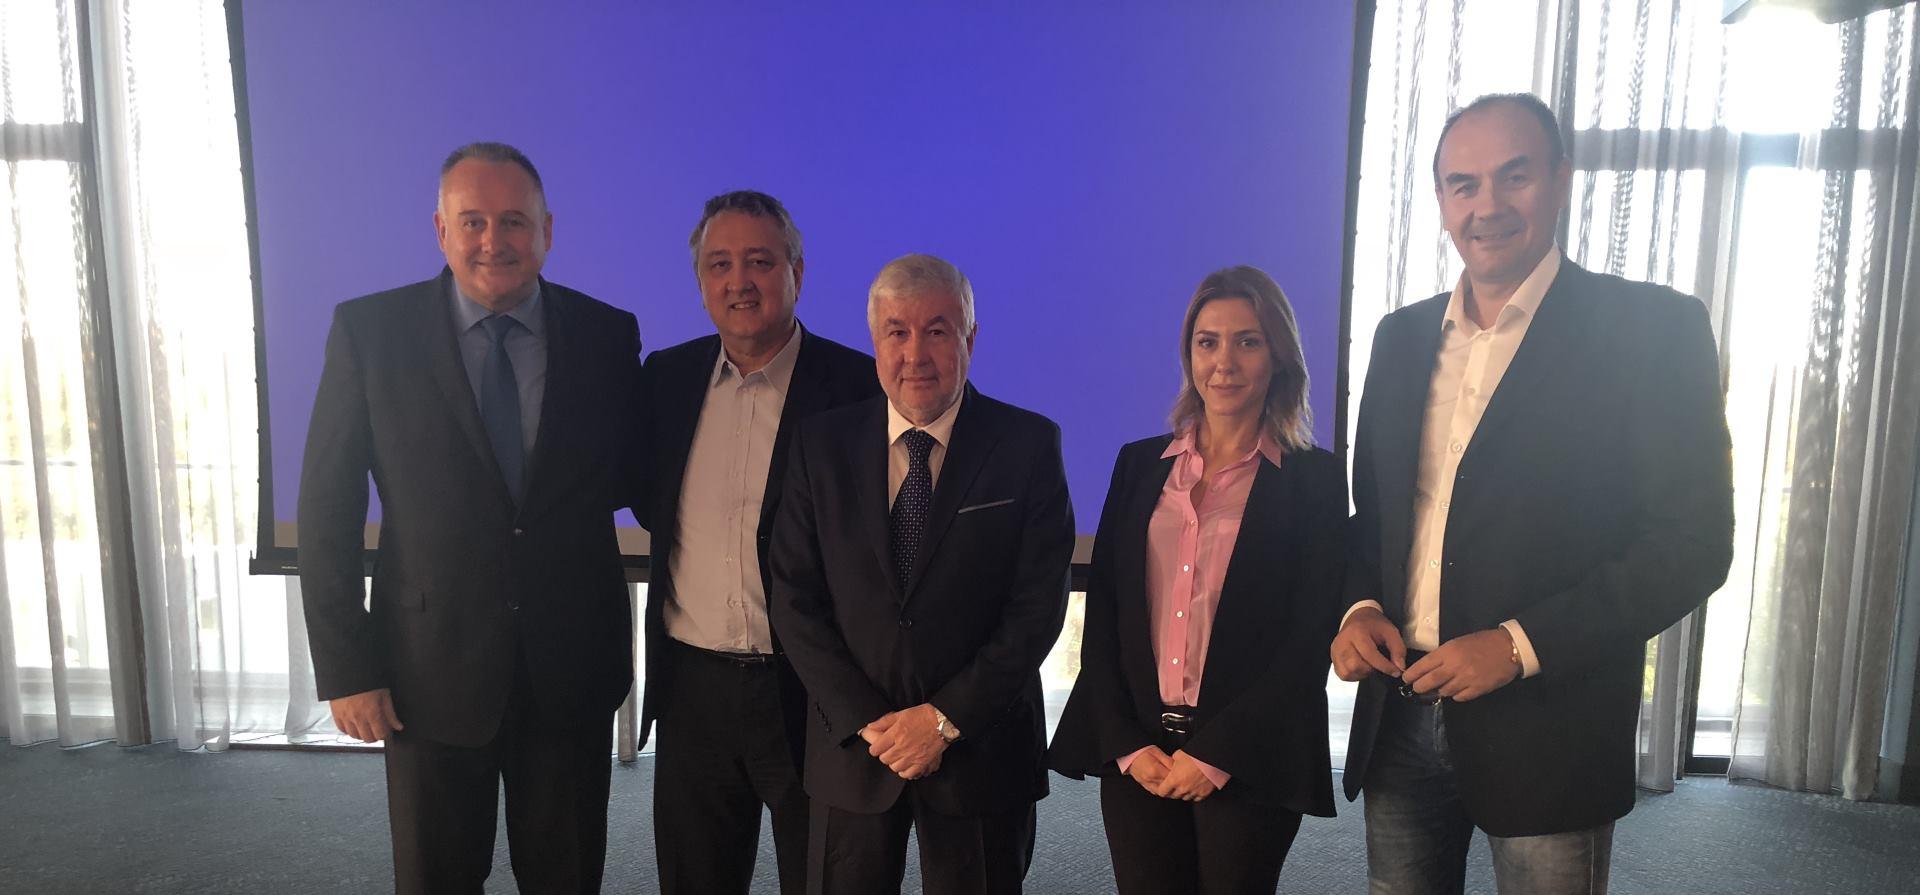 Hrvatska dobila domaćinstvo za Europsko prvenstvo u vaterpolu